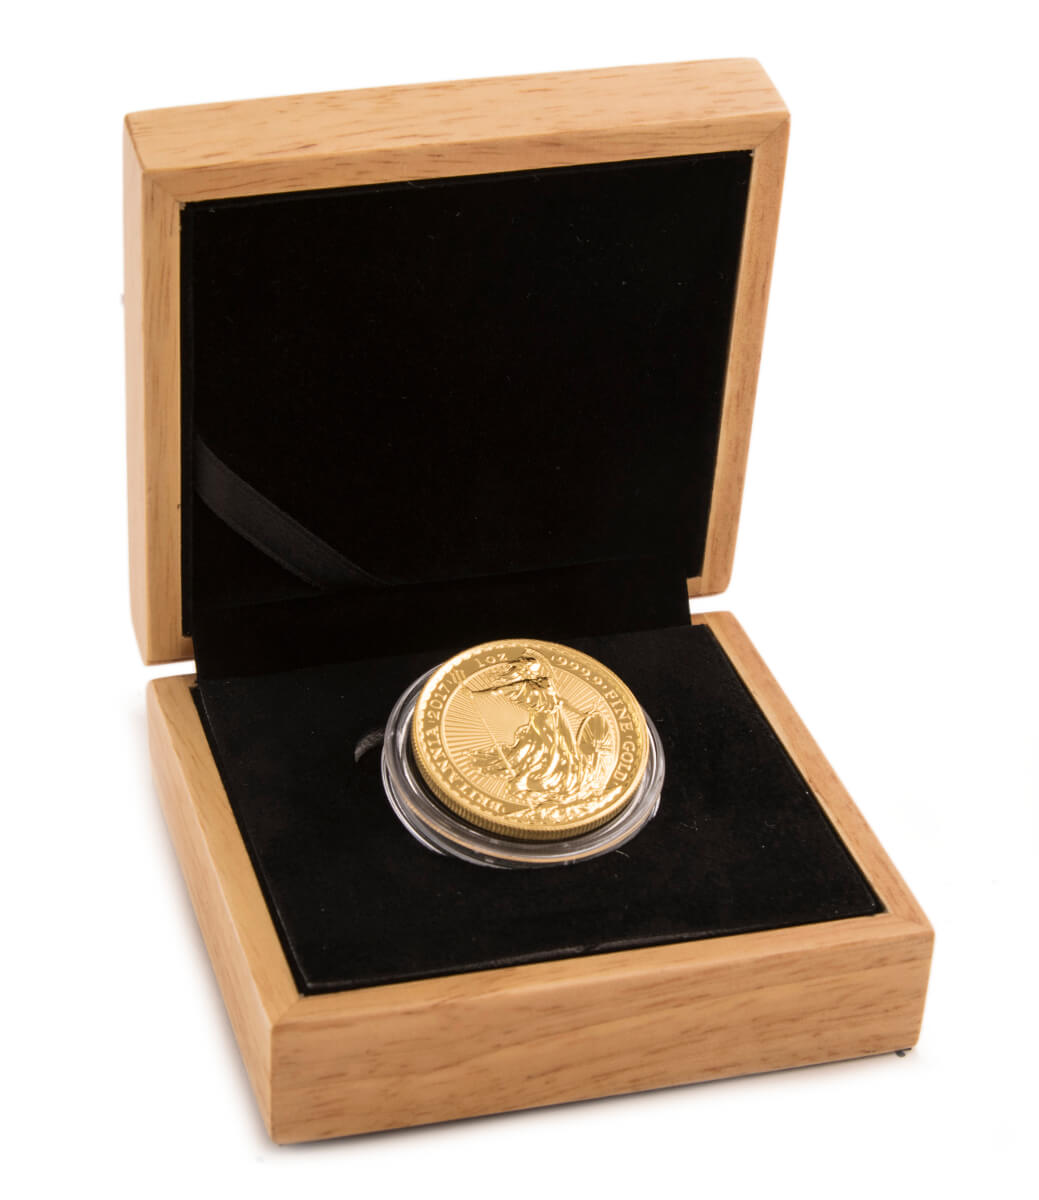 2017 Gold Britannia One Ounce - Boxed